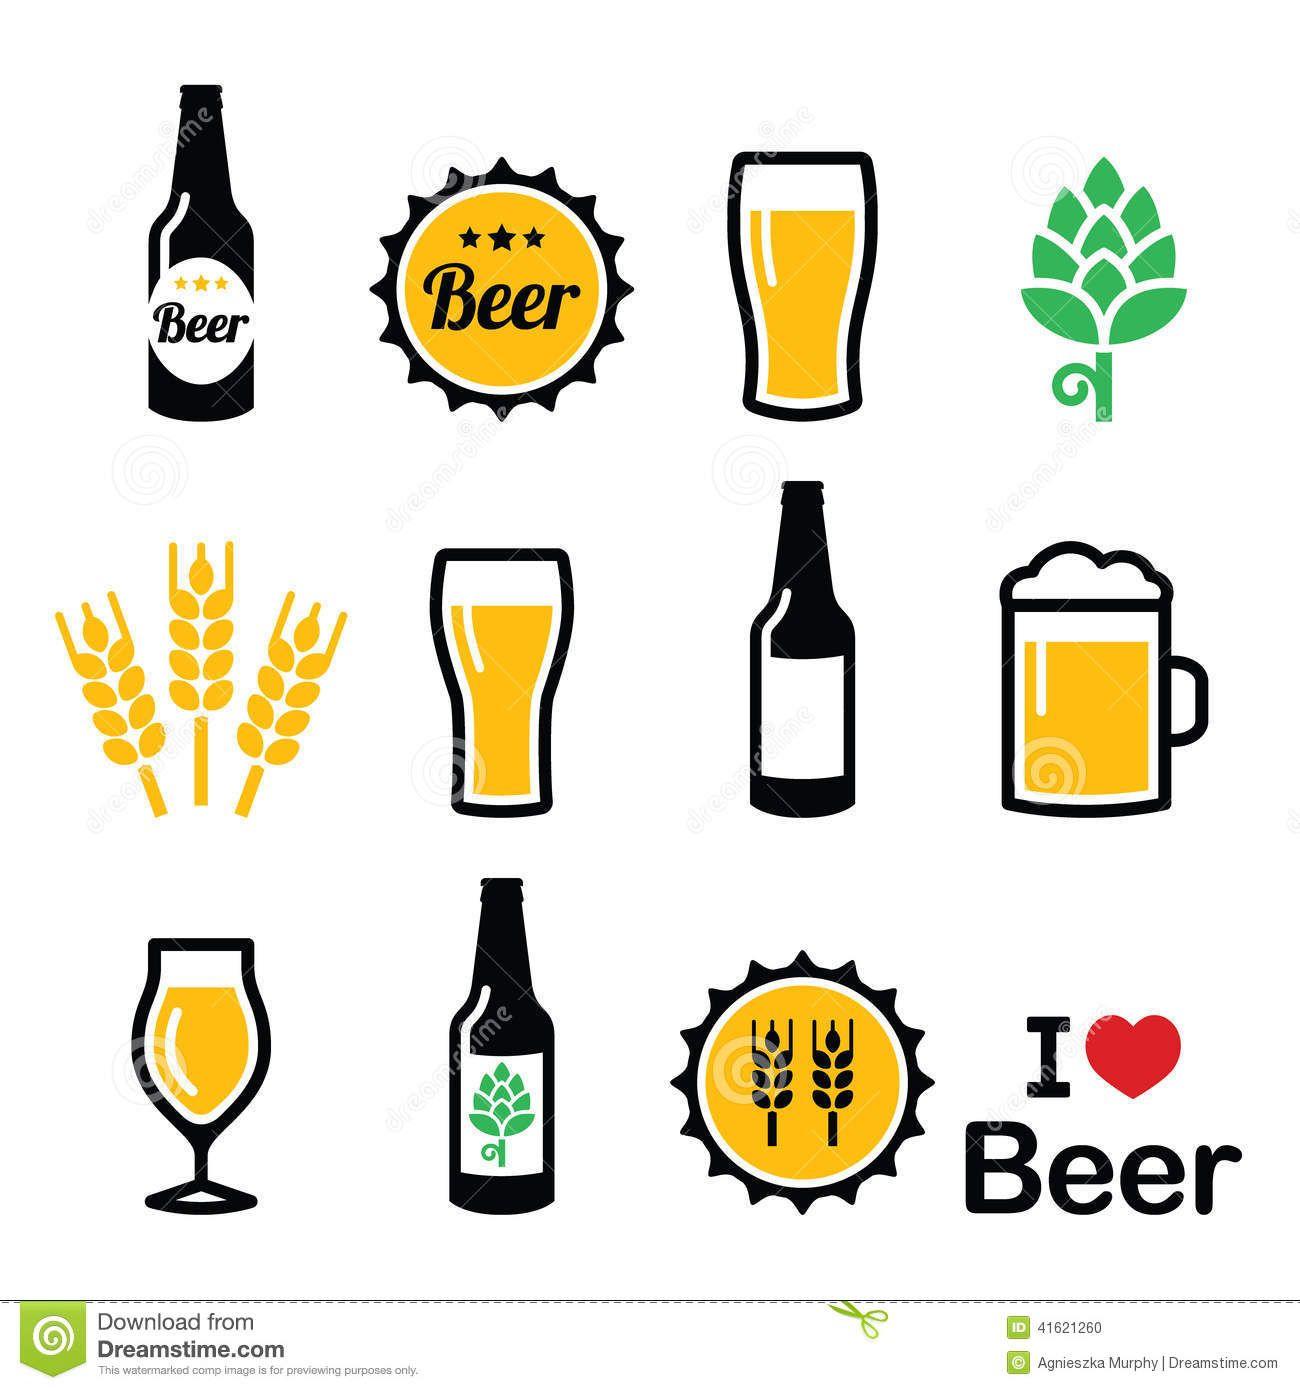 beer icon Google 검색 맥주, 실크 스크린, 아이콘